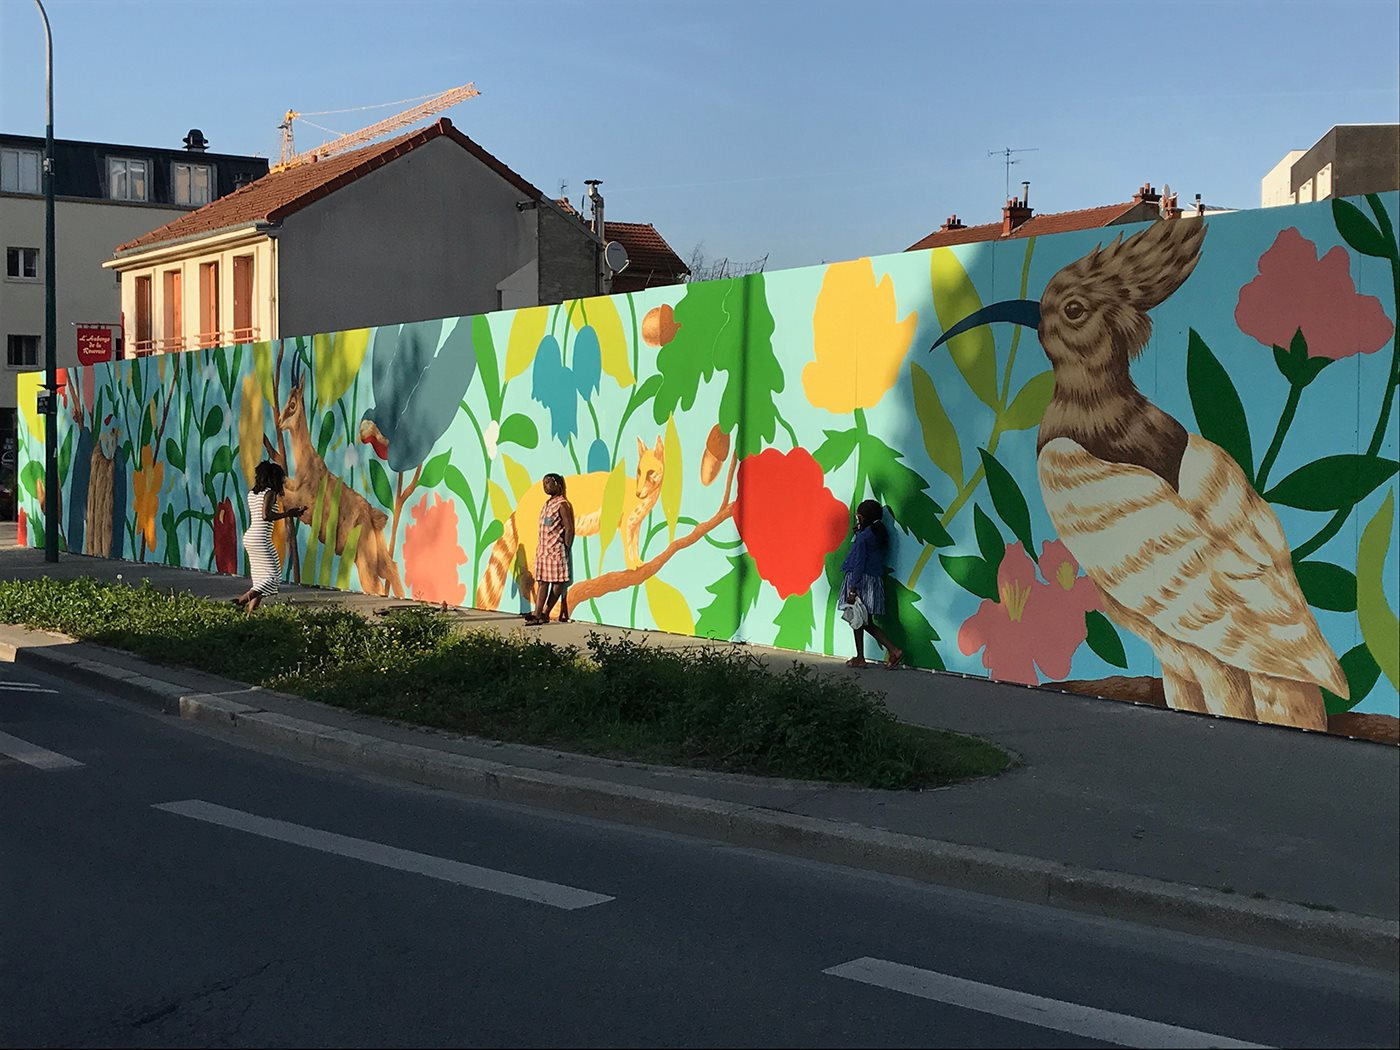 arturbain murales quai 36 Saddo 5 - Quai 36 invite des street artistes à colorer halls de gare et palissades de chantiers